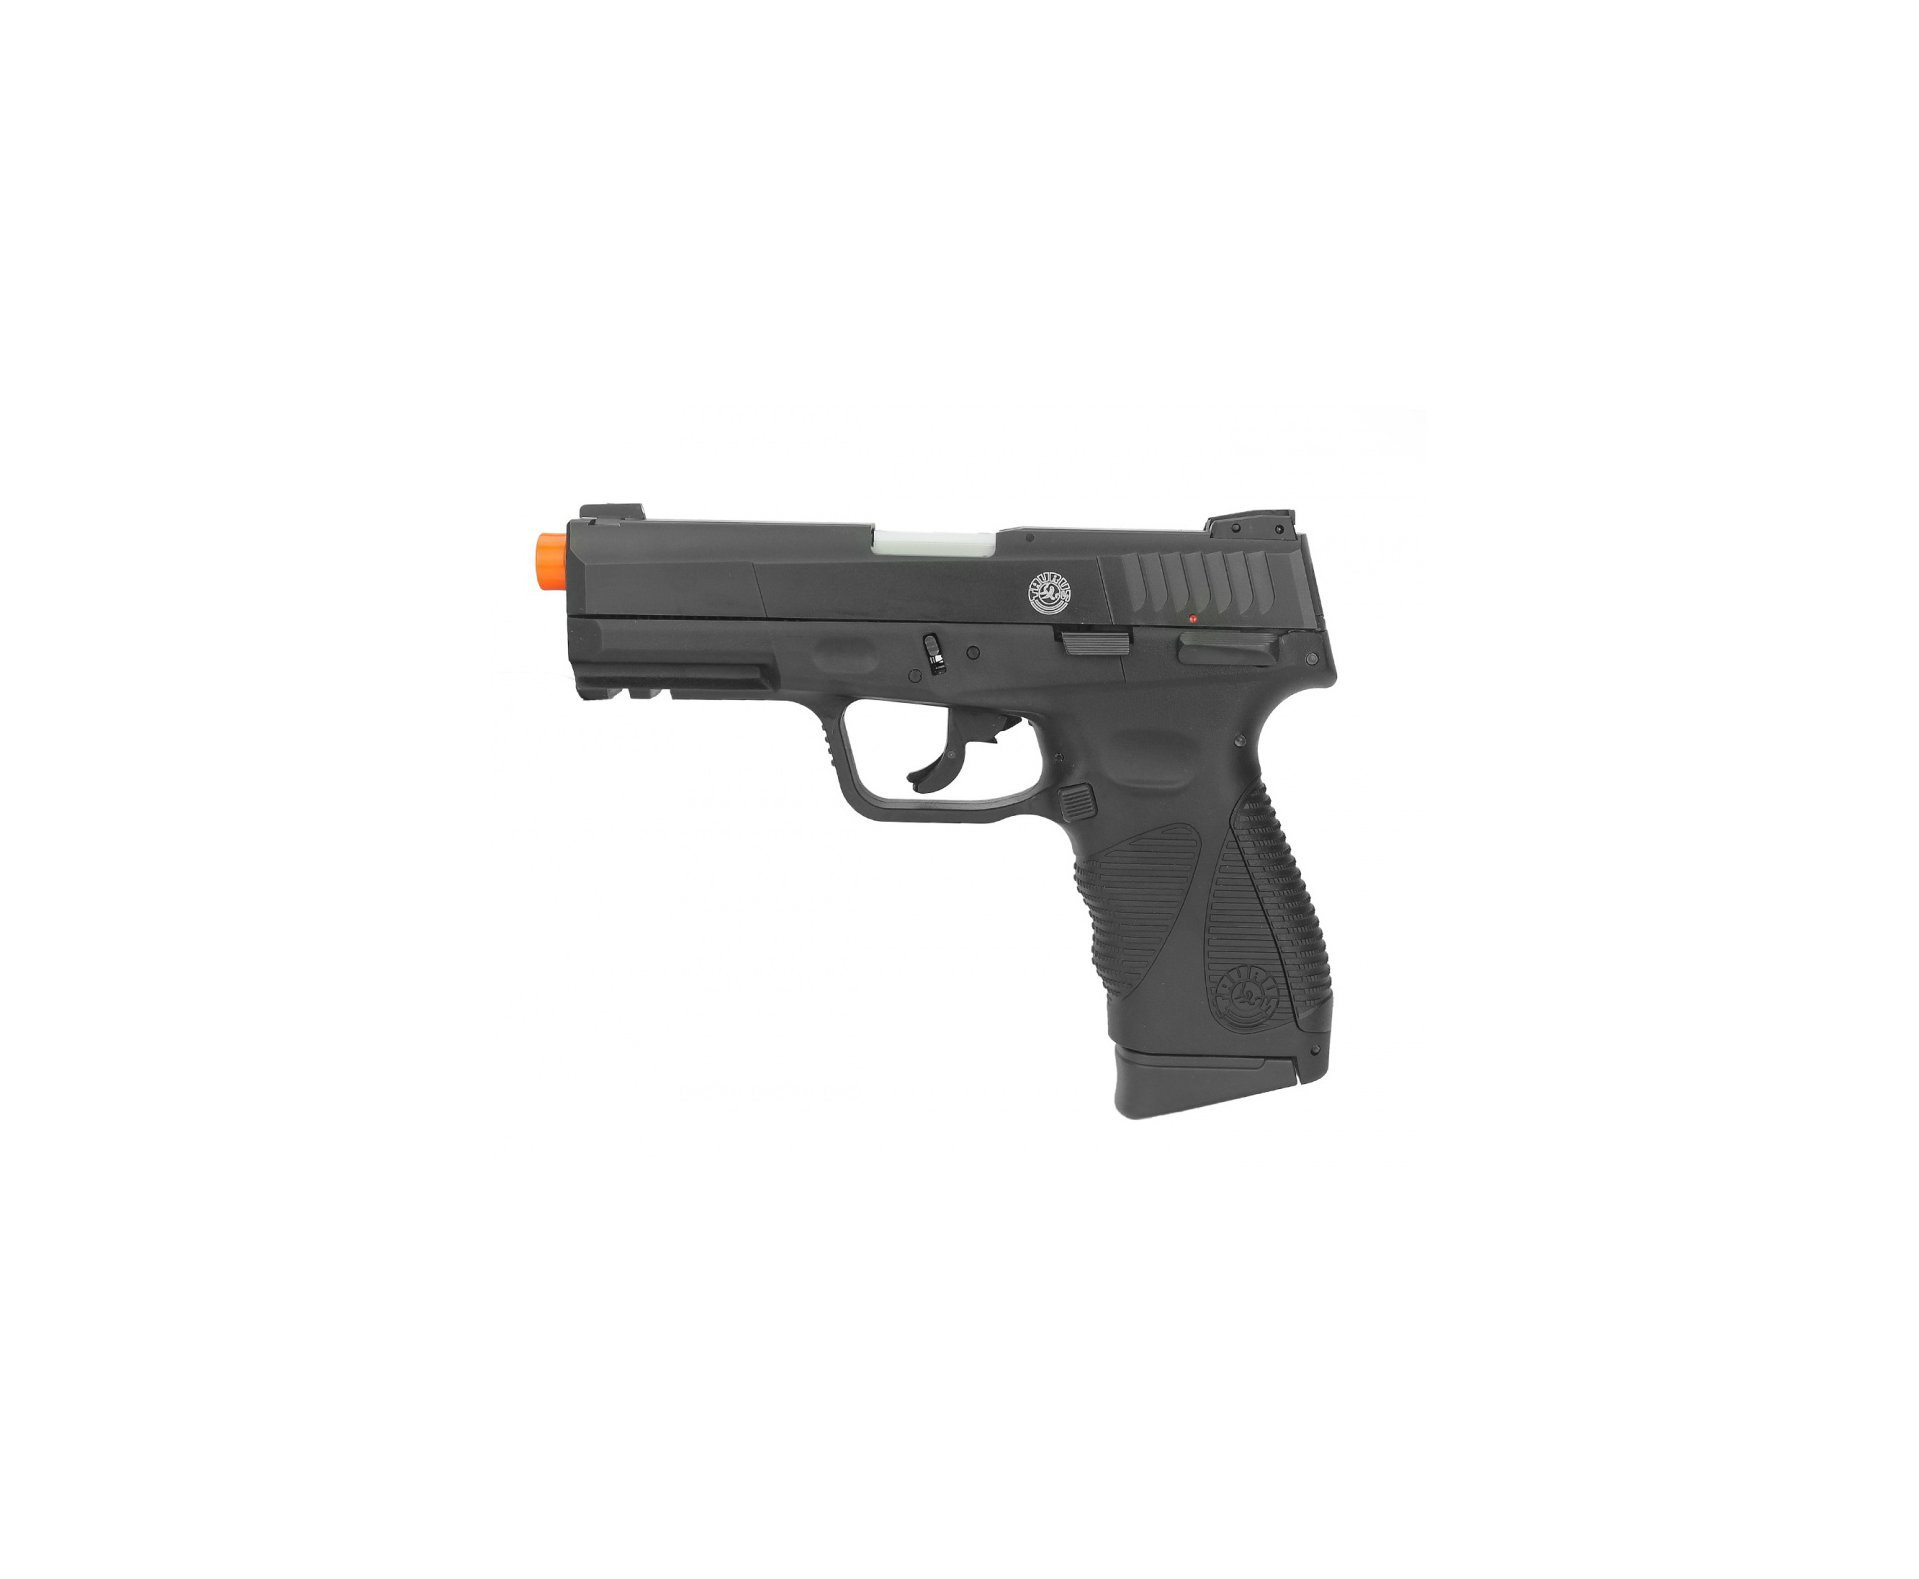 Pistola De Airsoft Gas Co2 Taurus Pt 24/7 G2 Blowback Preta 6mm + Bbs + 02 Co2